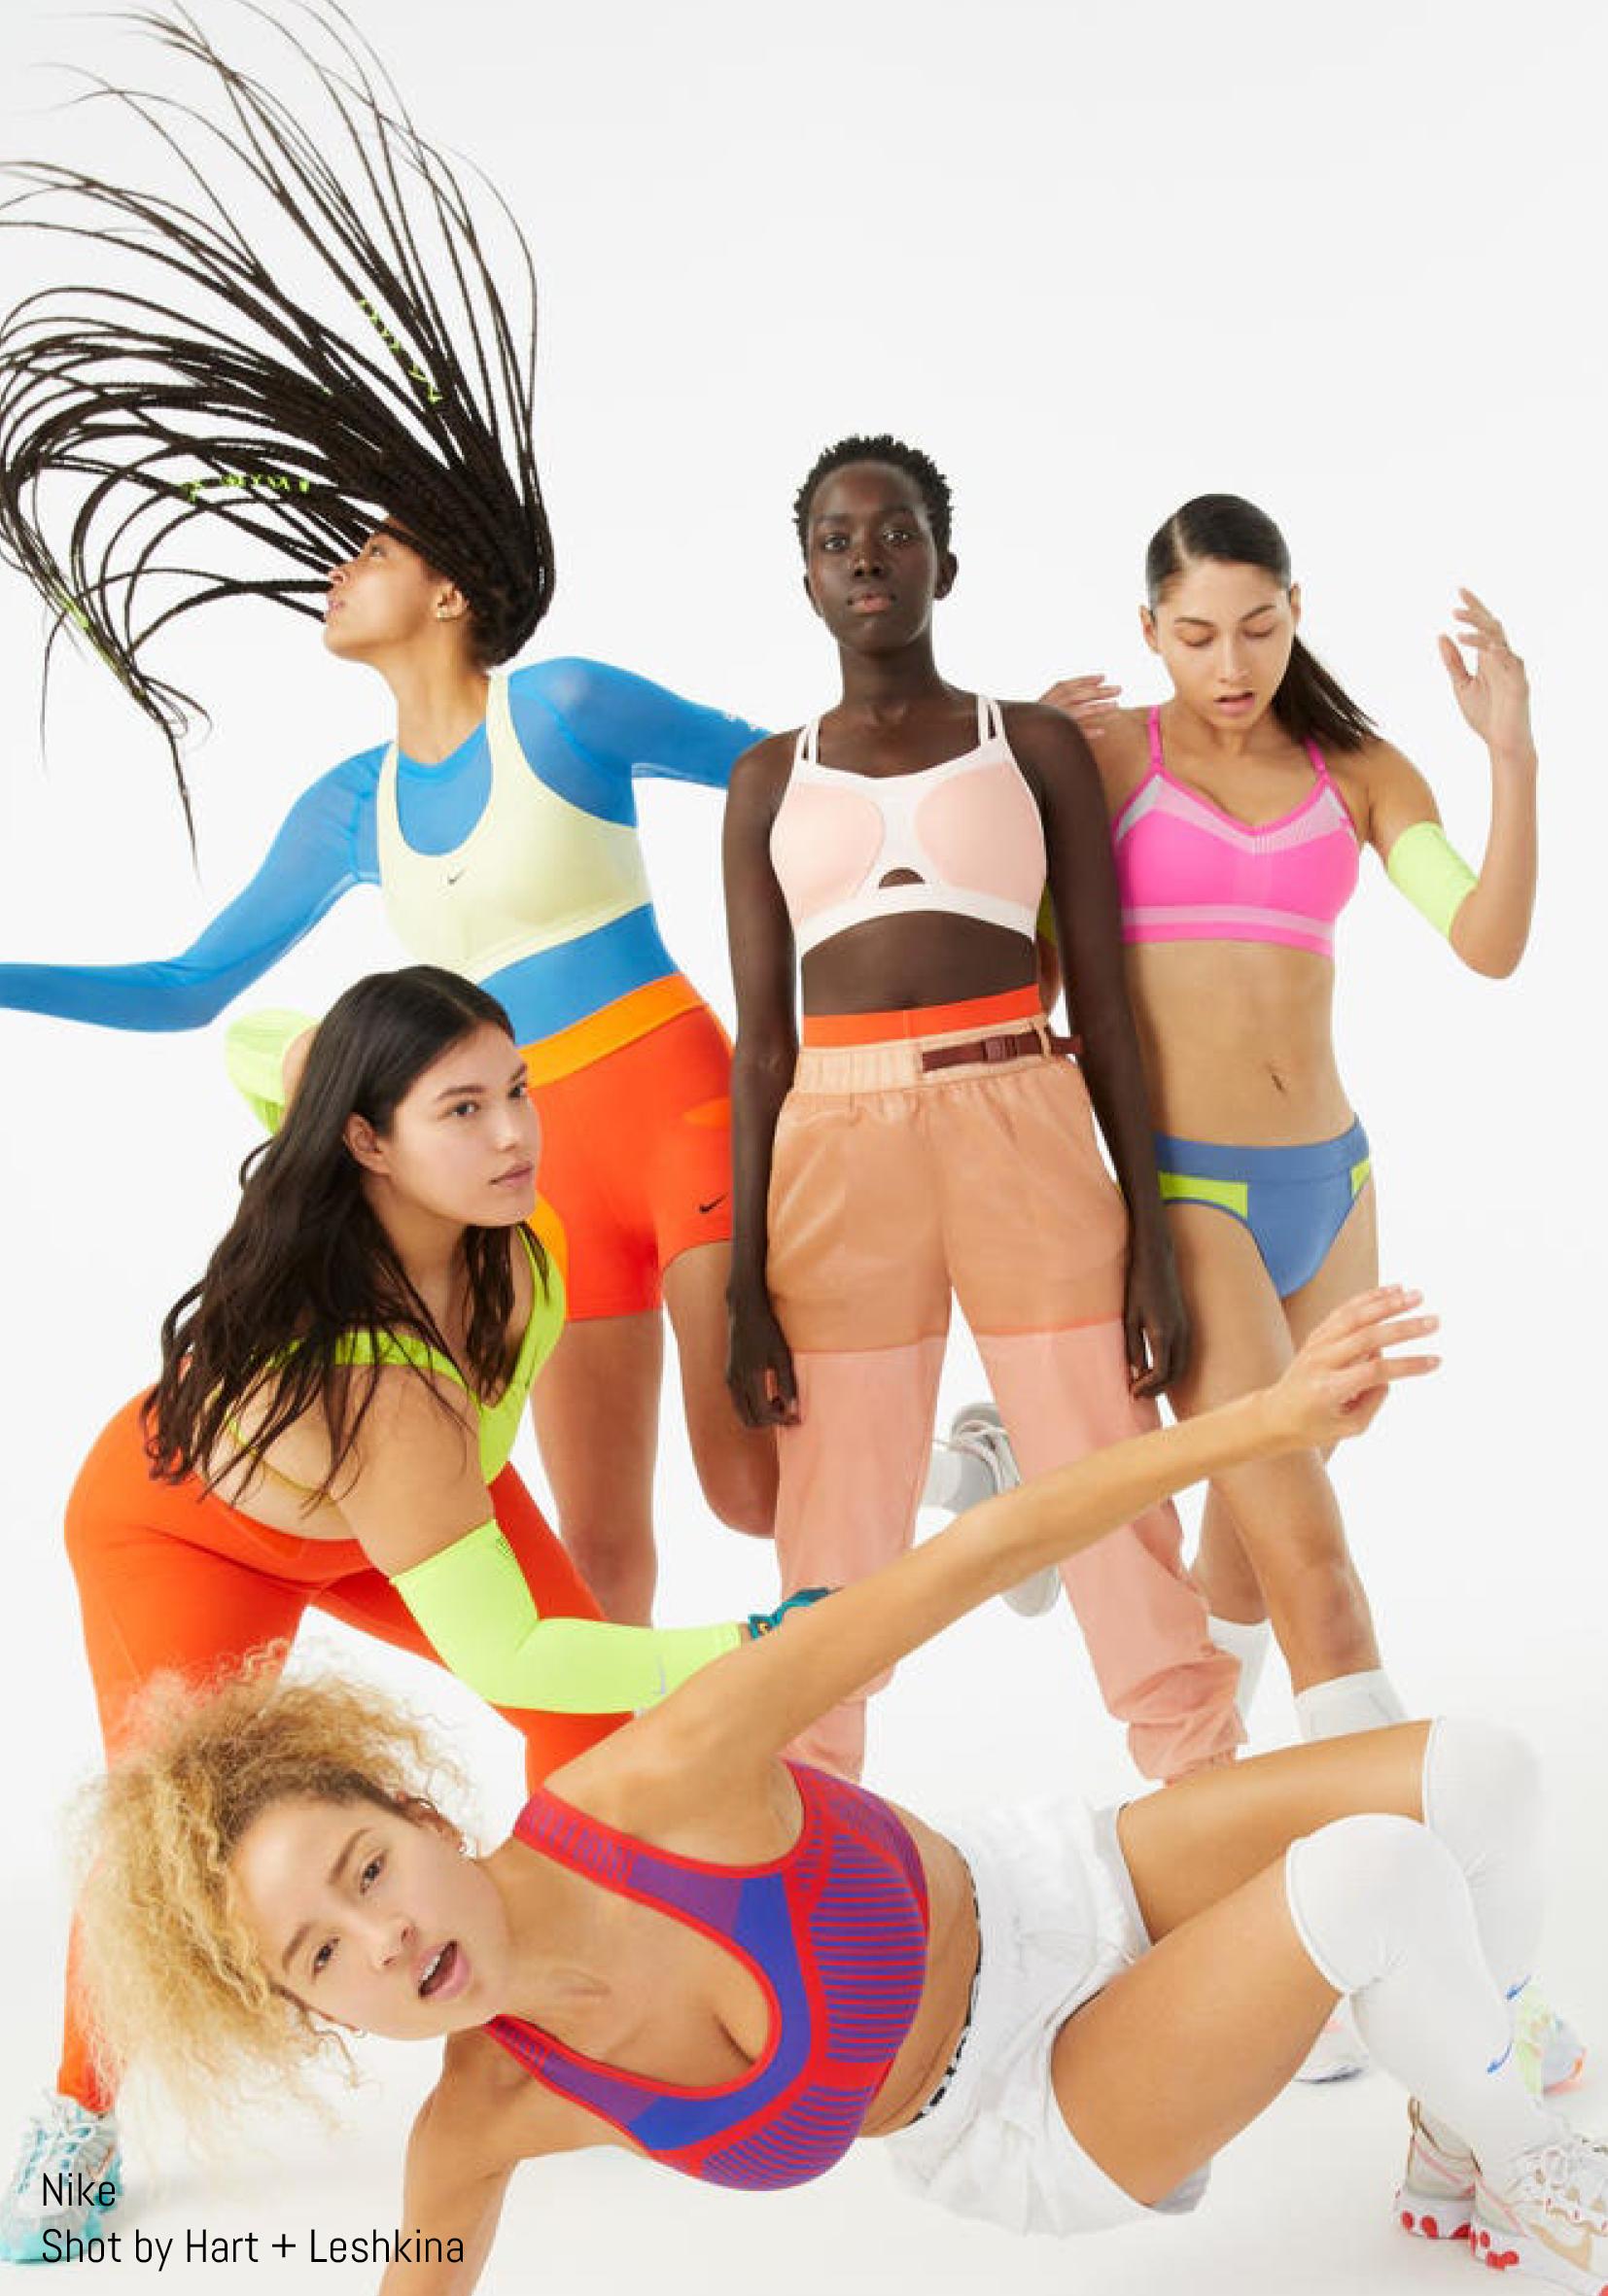 Models pose for Nike Shot by Hart + Leshkina